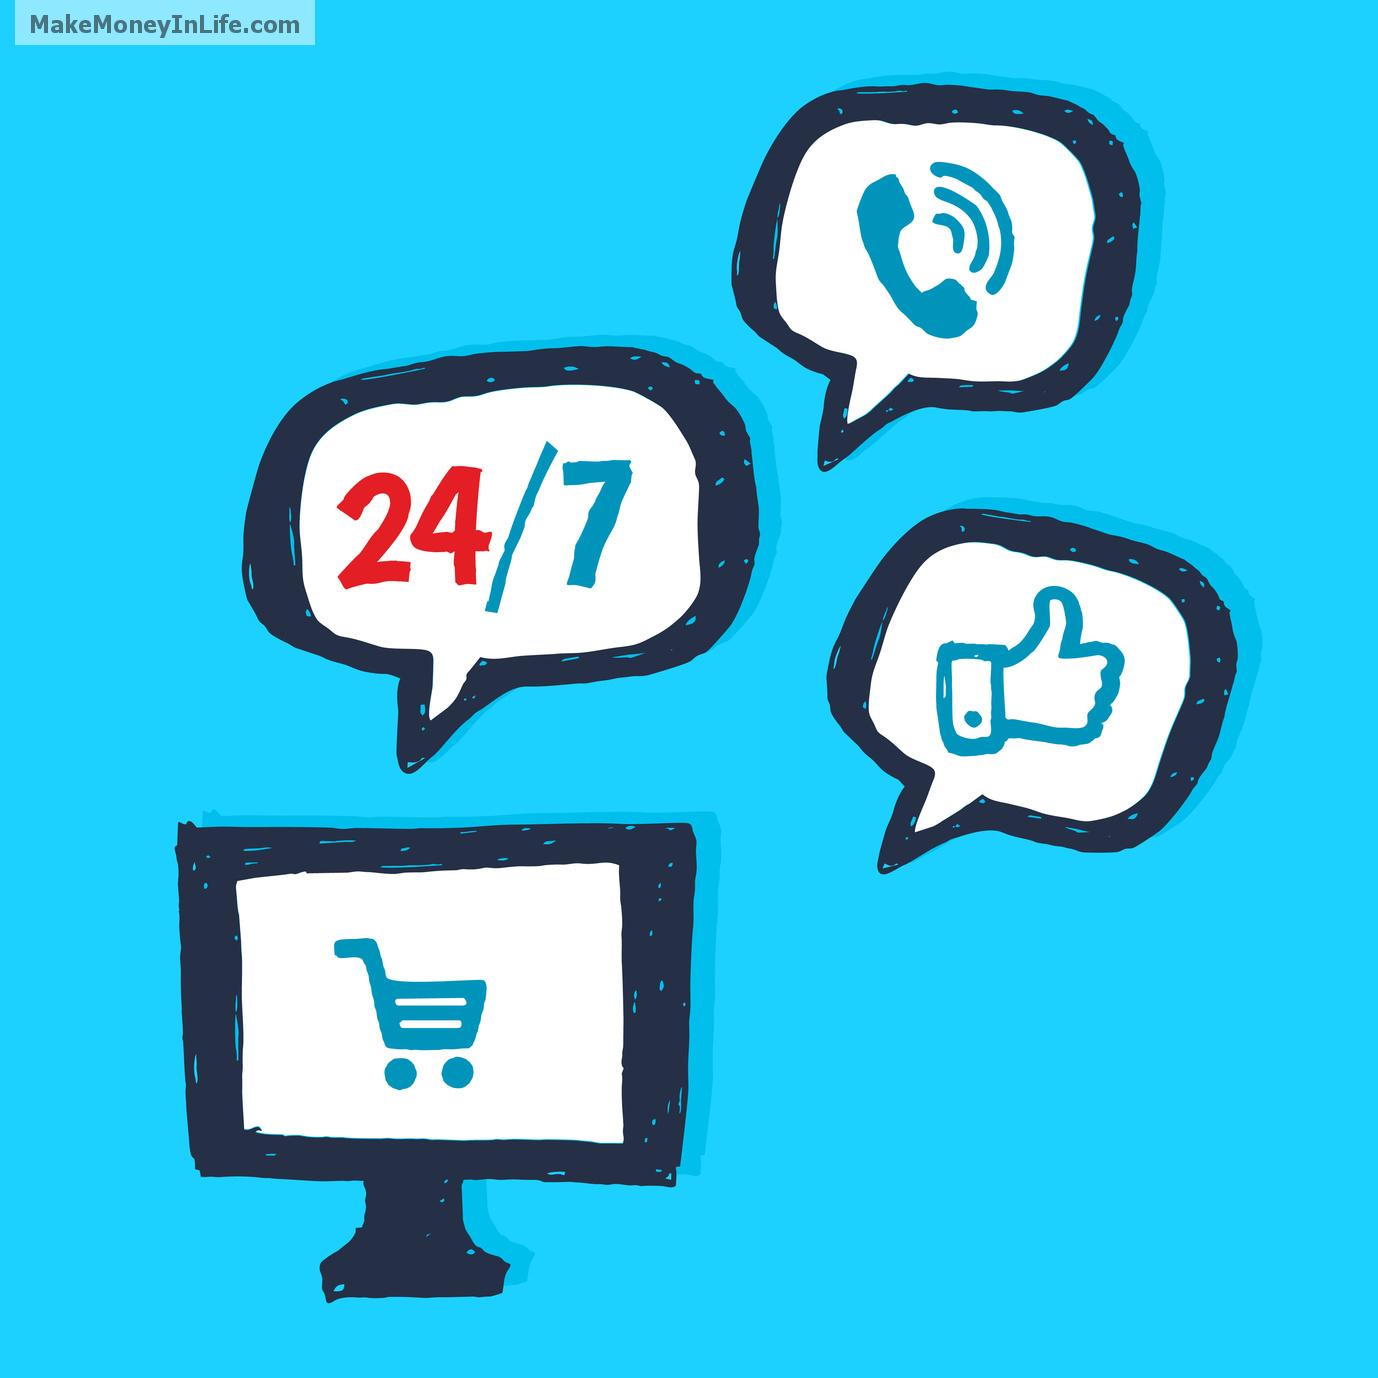 24/7 online web-service